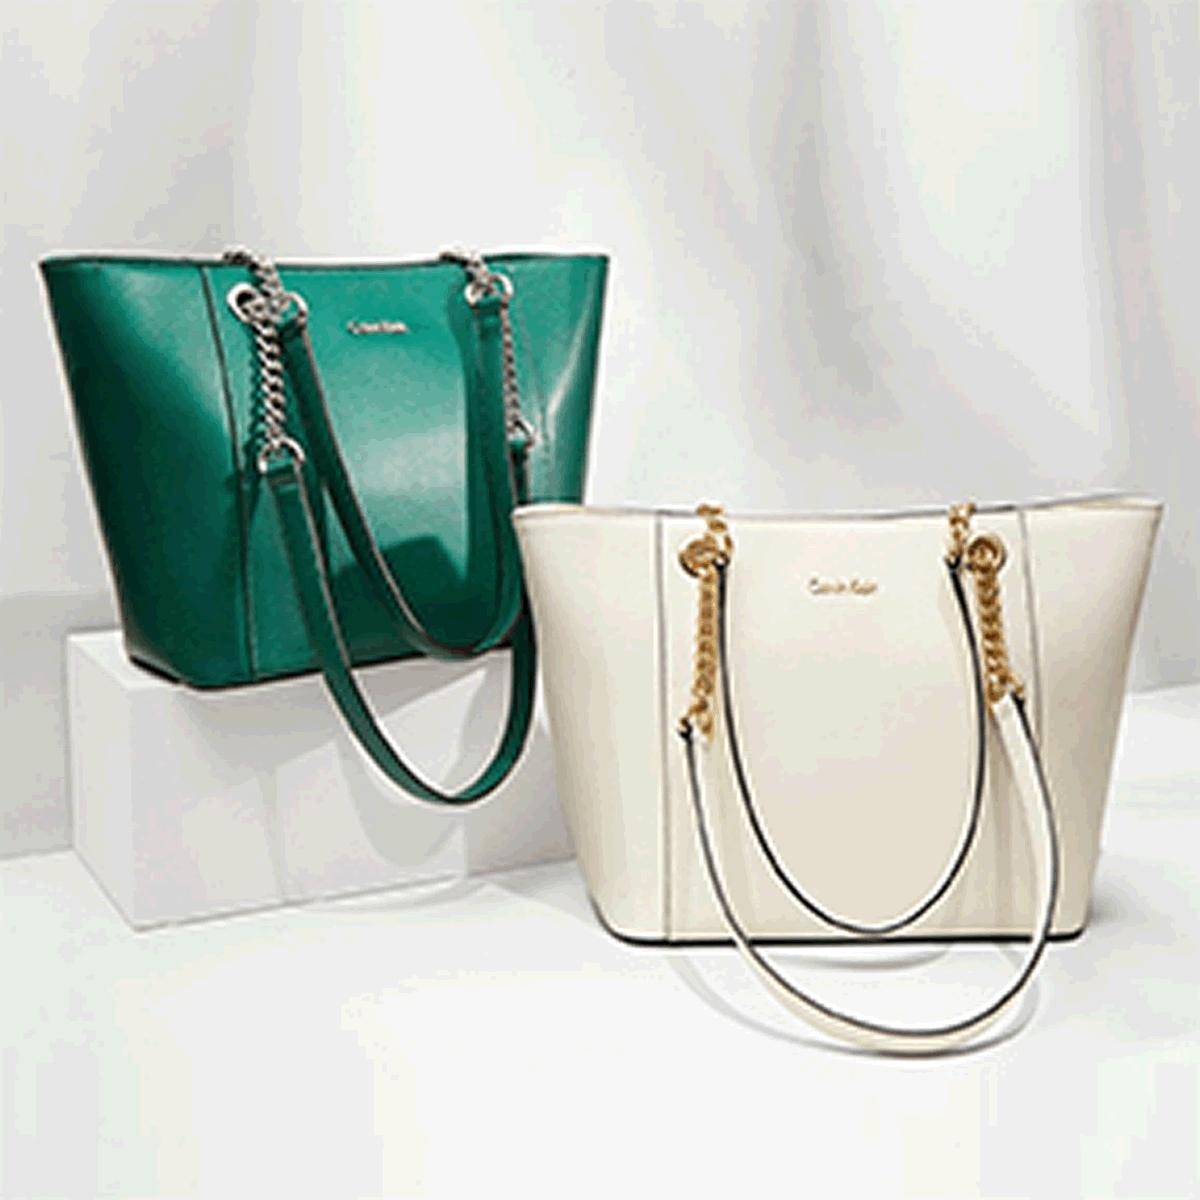 Handbags and Accessories Macys